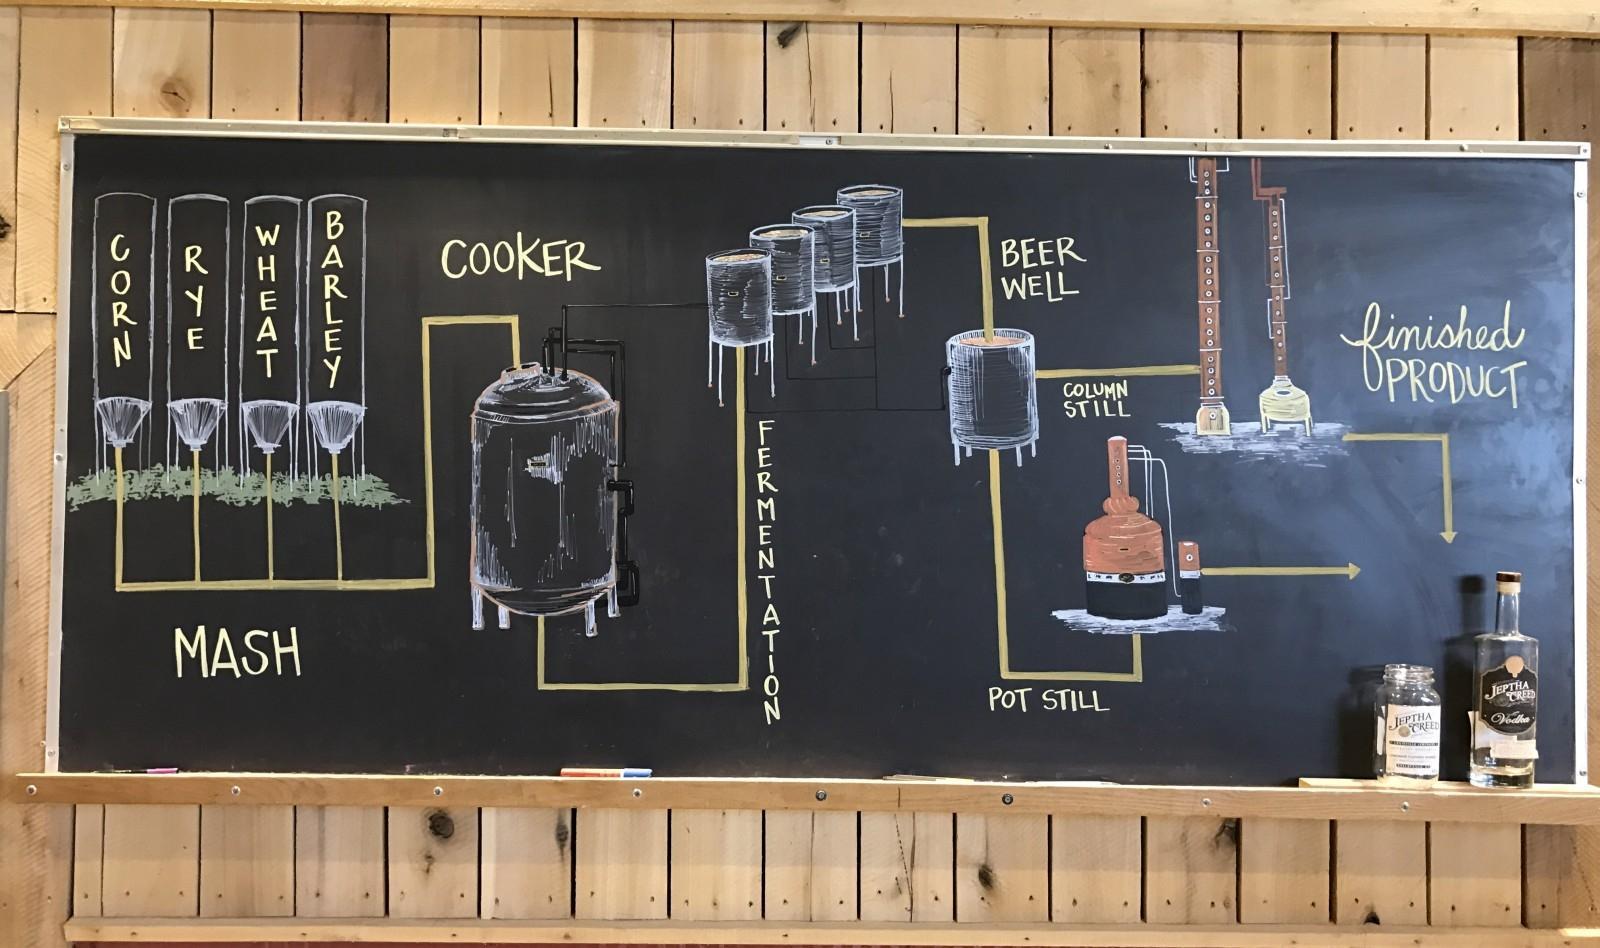 At Jeptha Creed Distillery